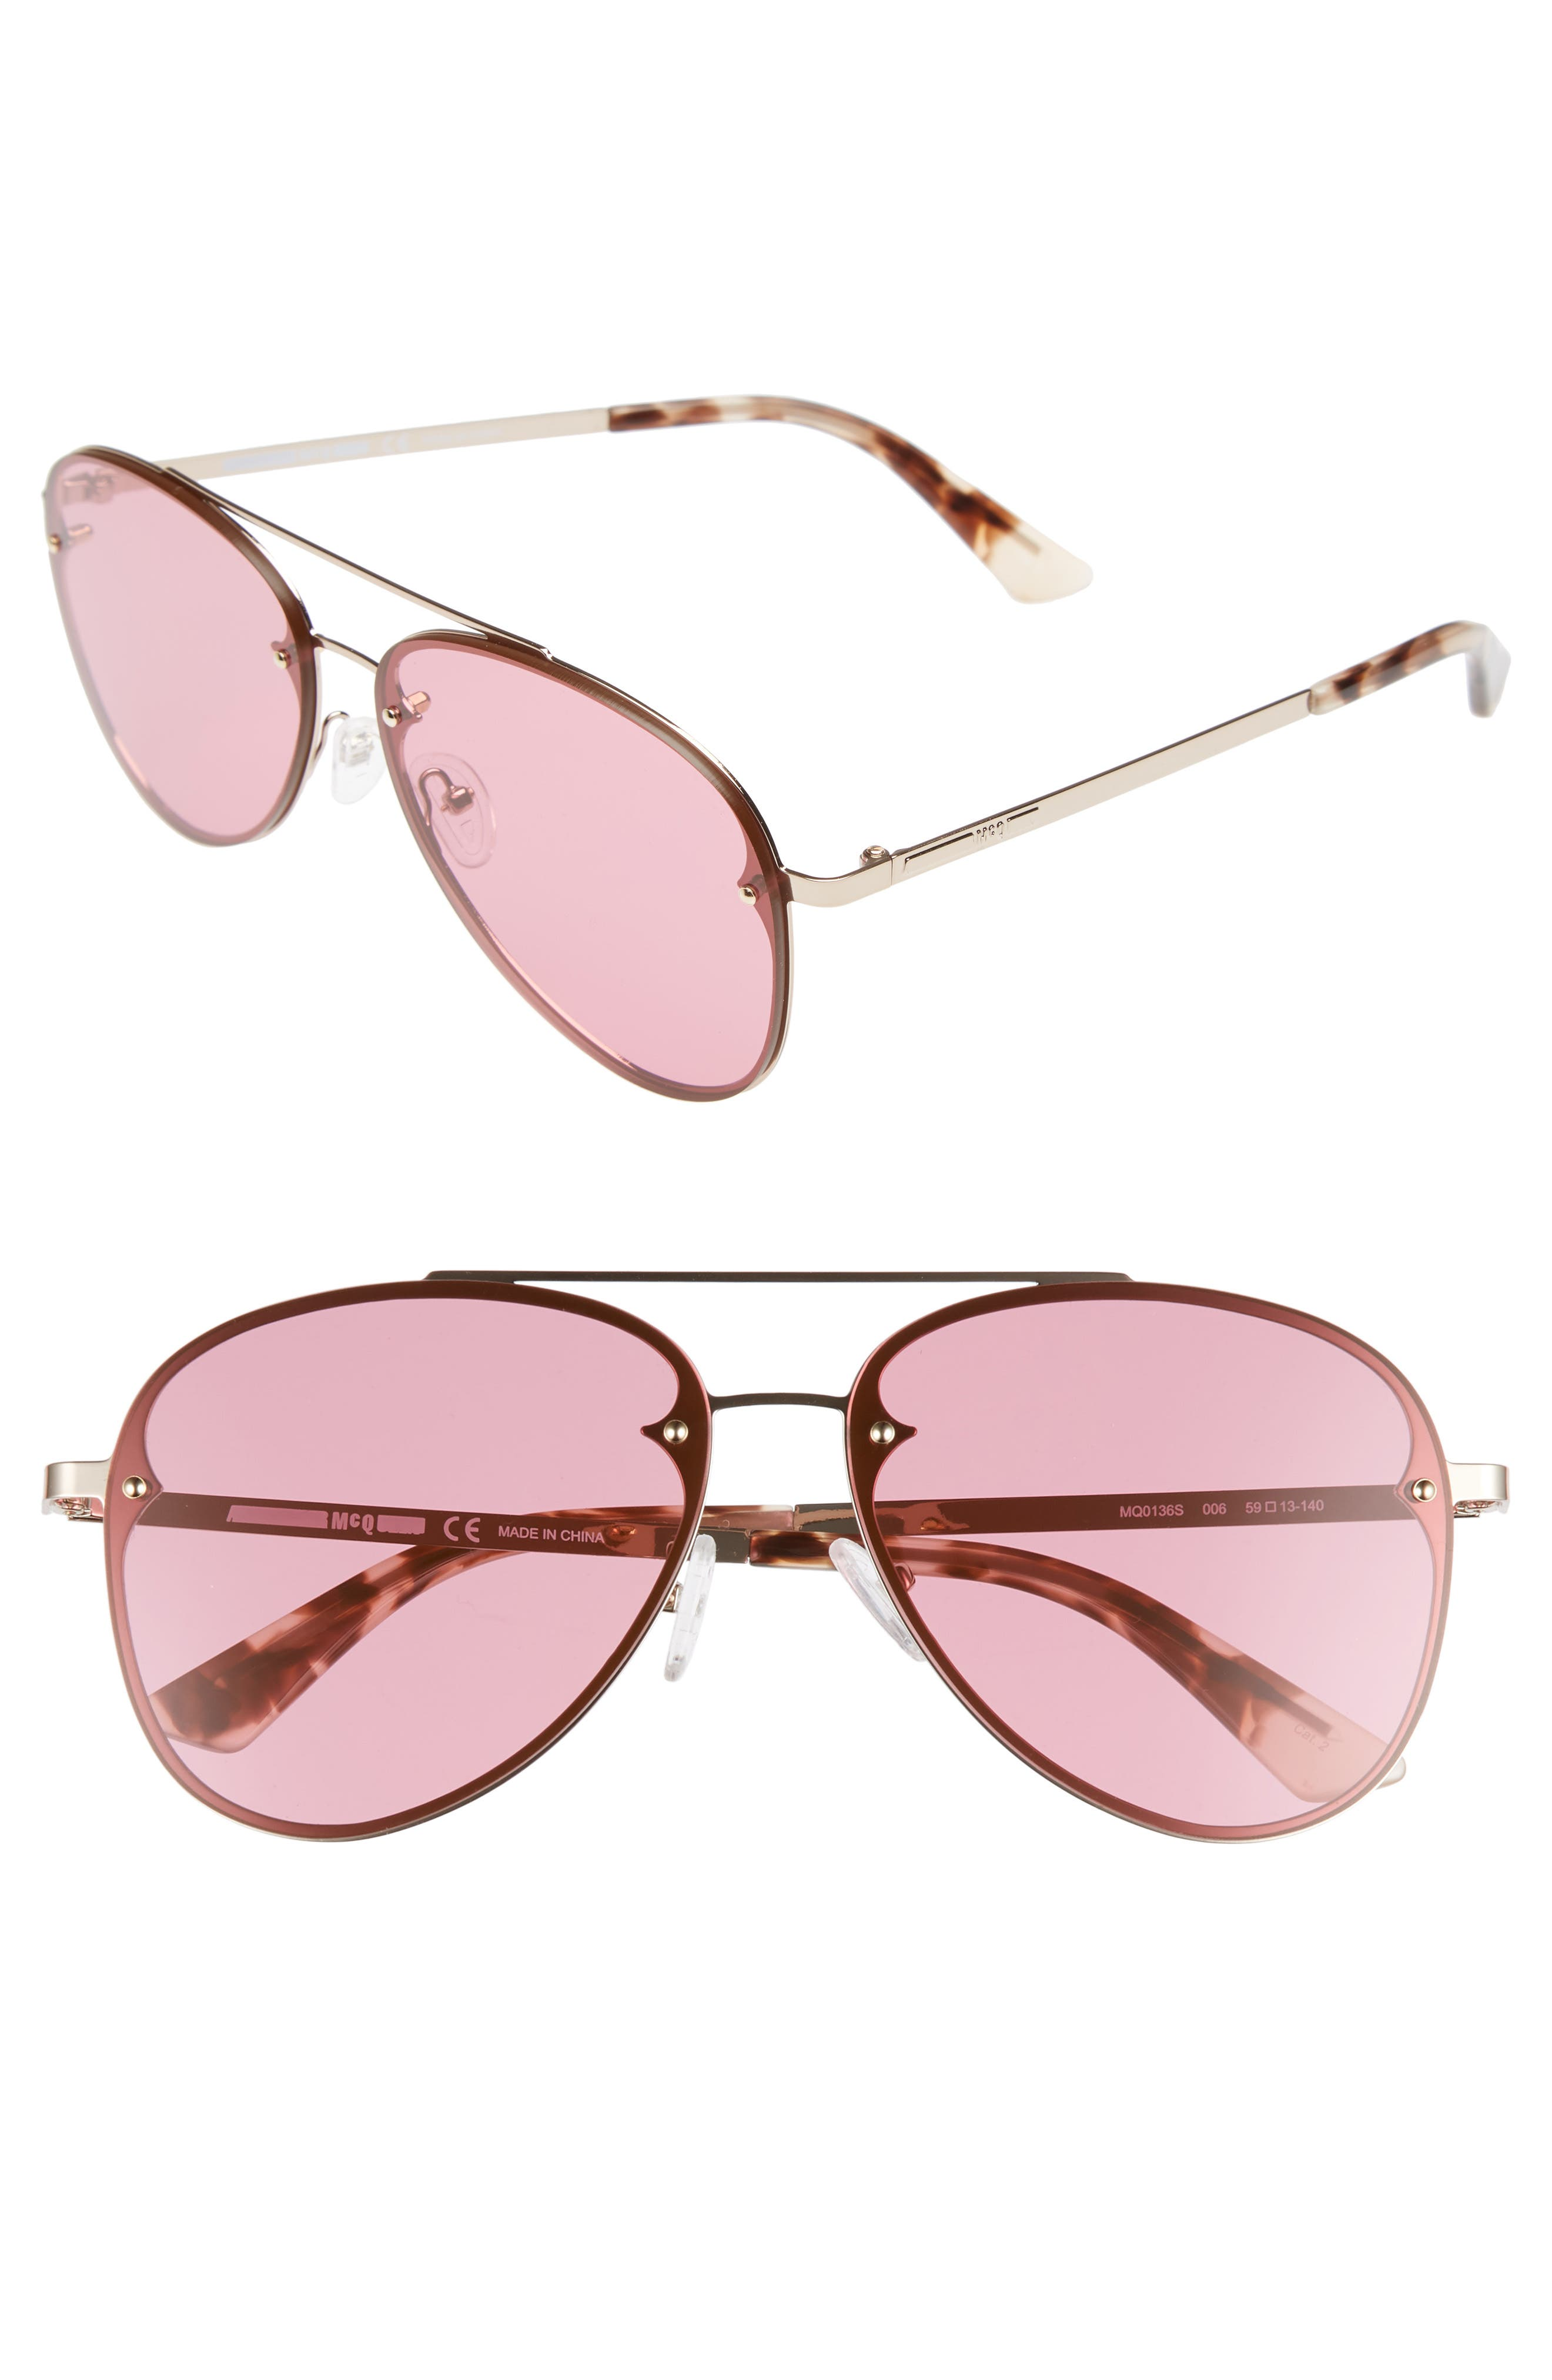 59mm Aviator Sunglasses,                         Main,                         color, Gold